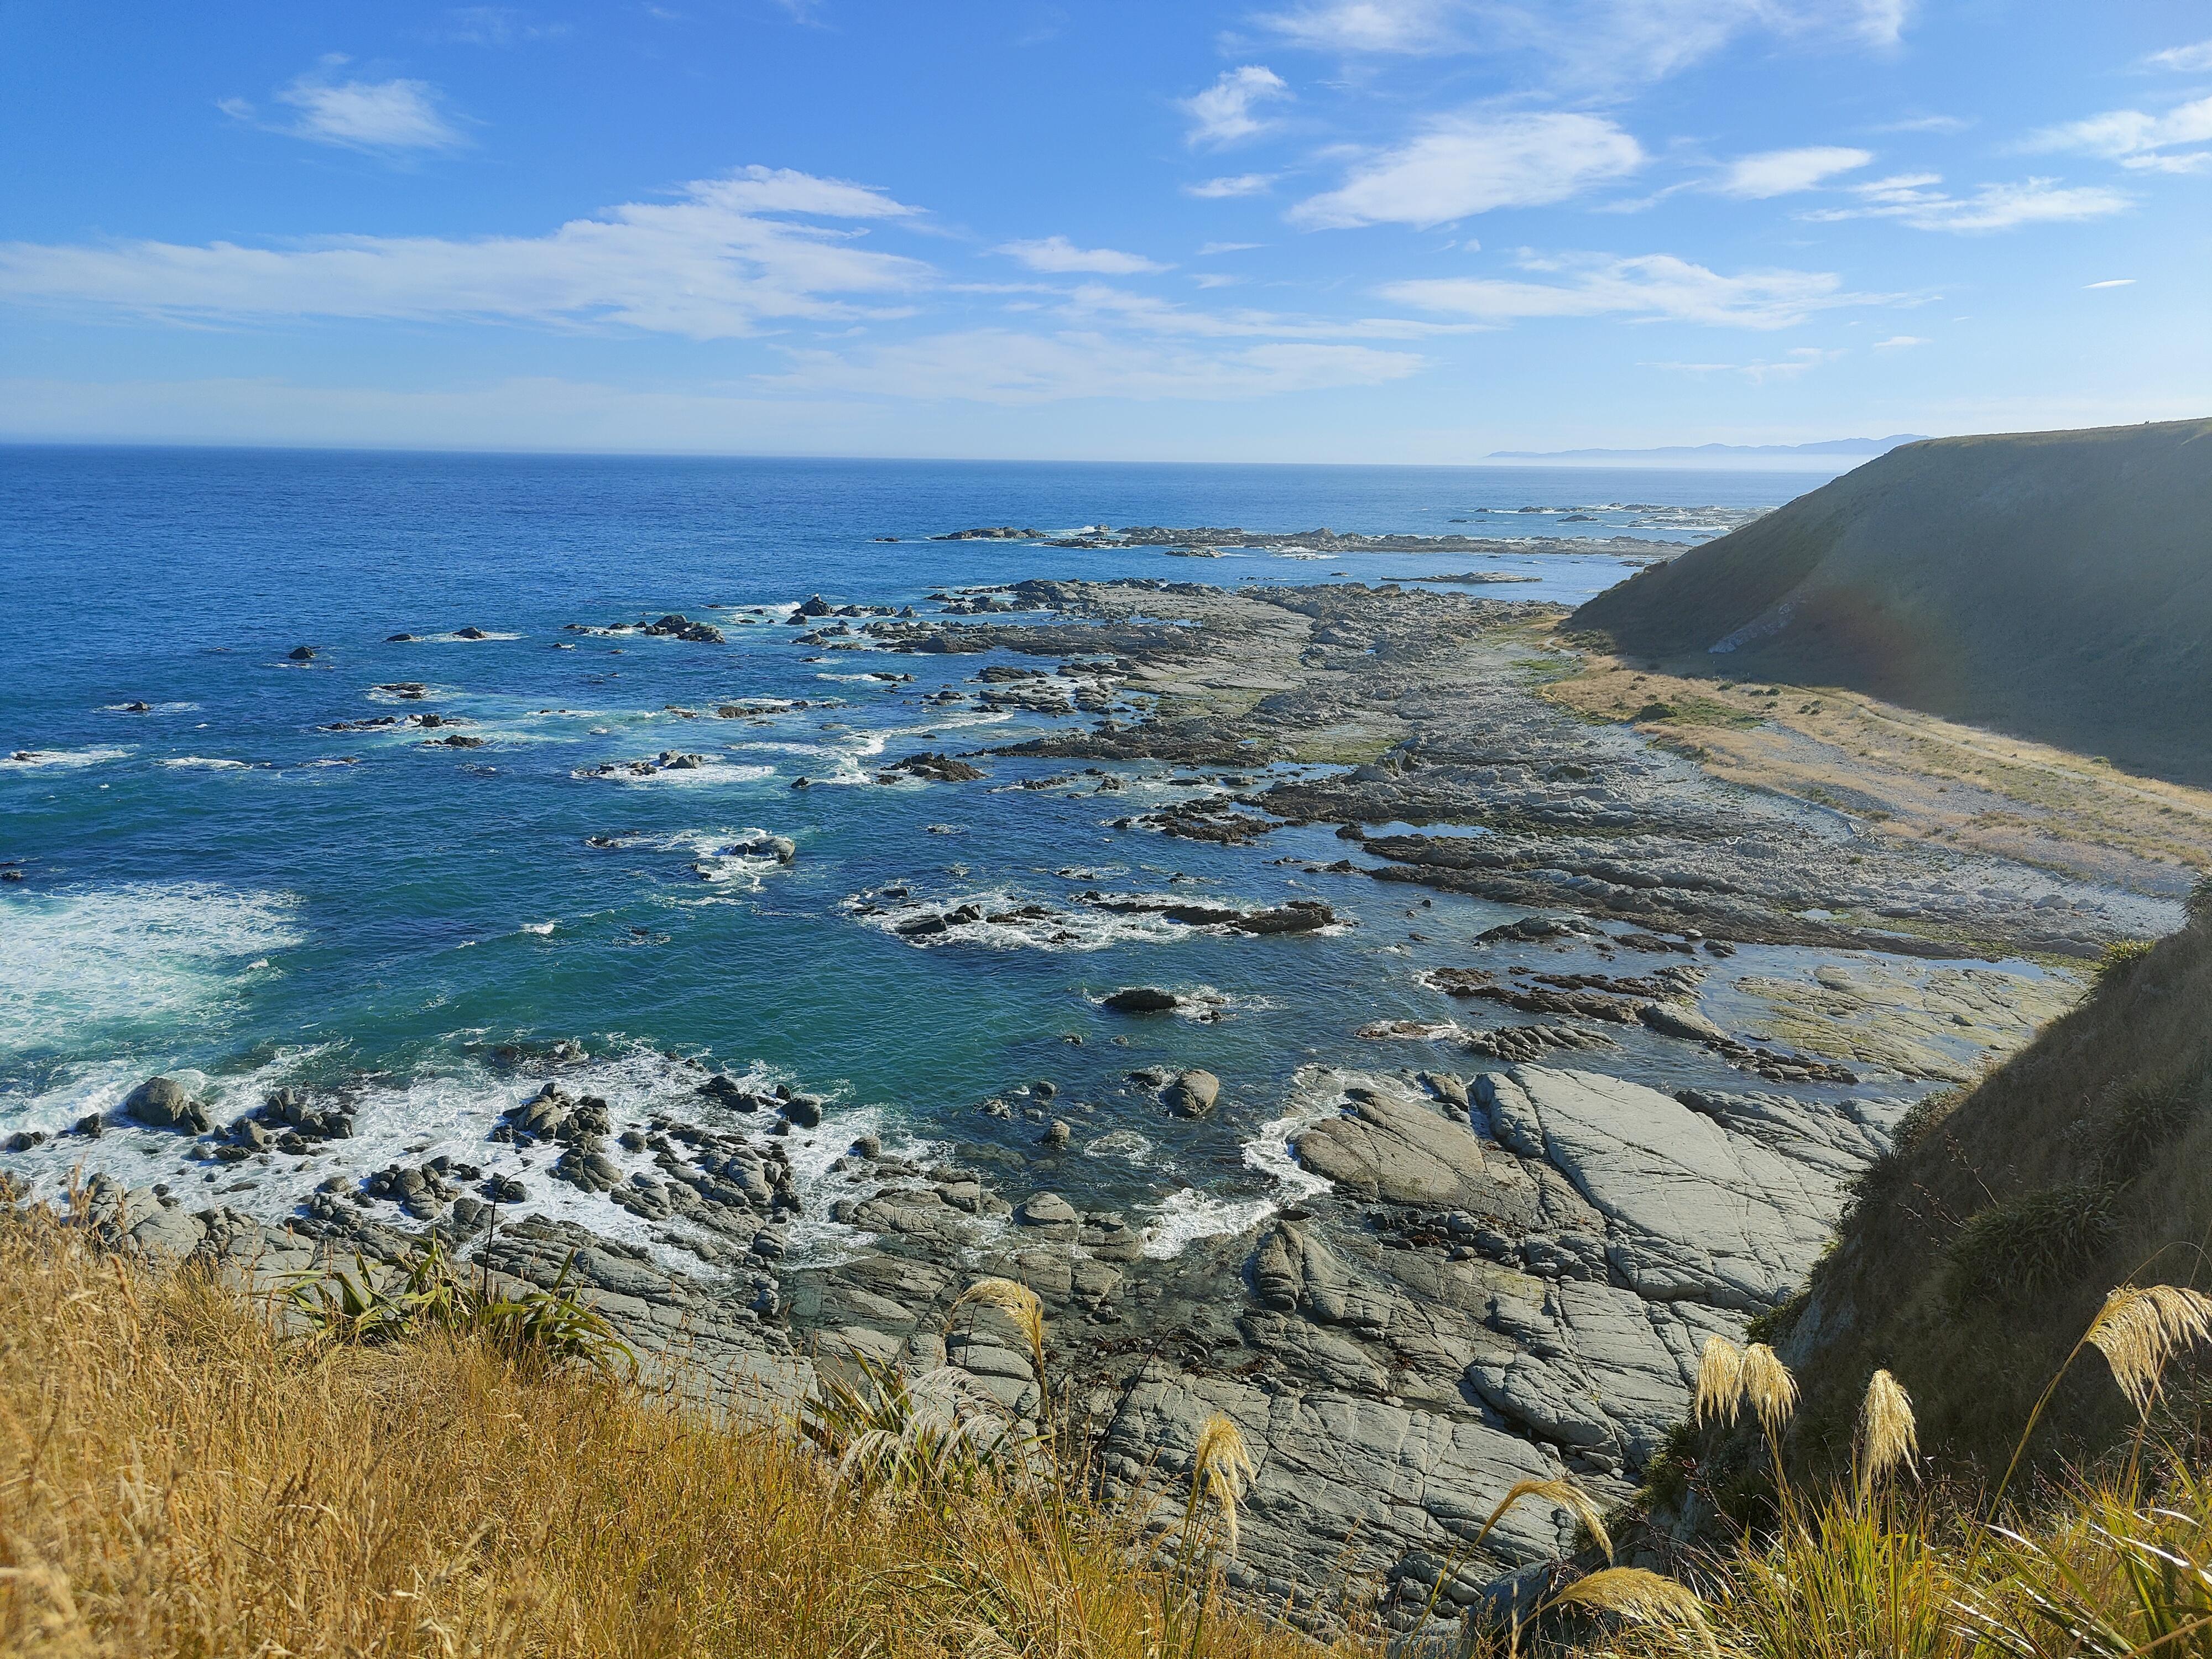 One of the rocky bays seen on the Kaikoura Peninsula Walkway